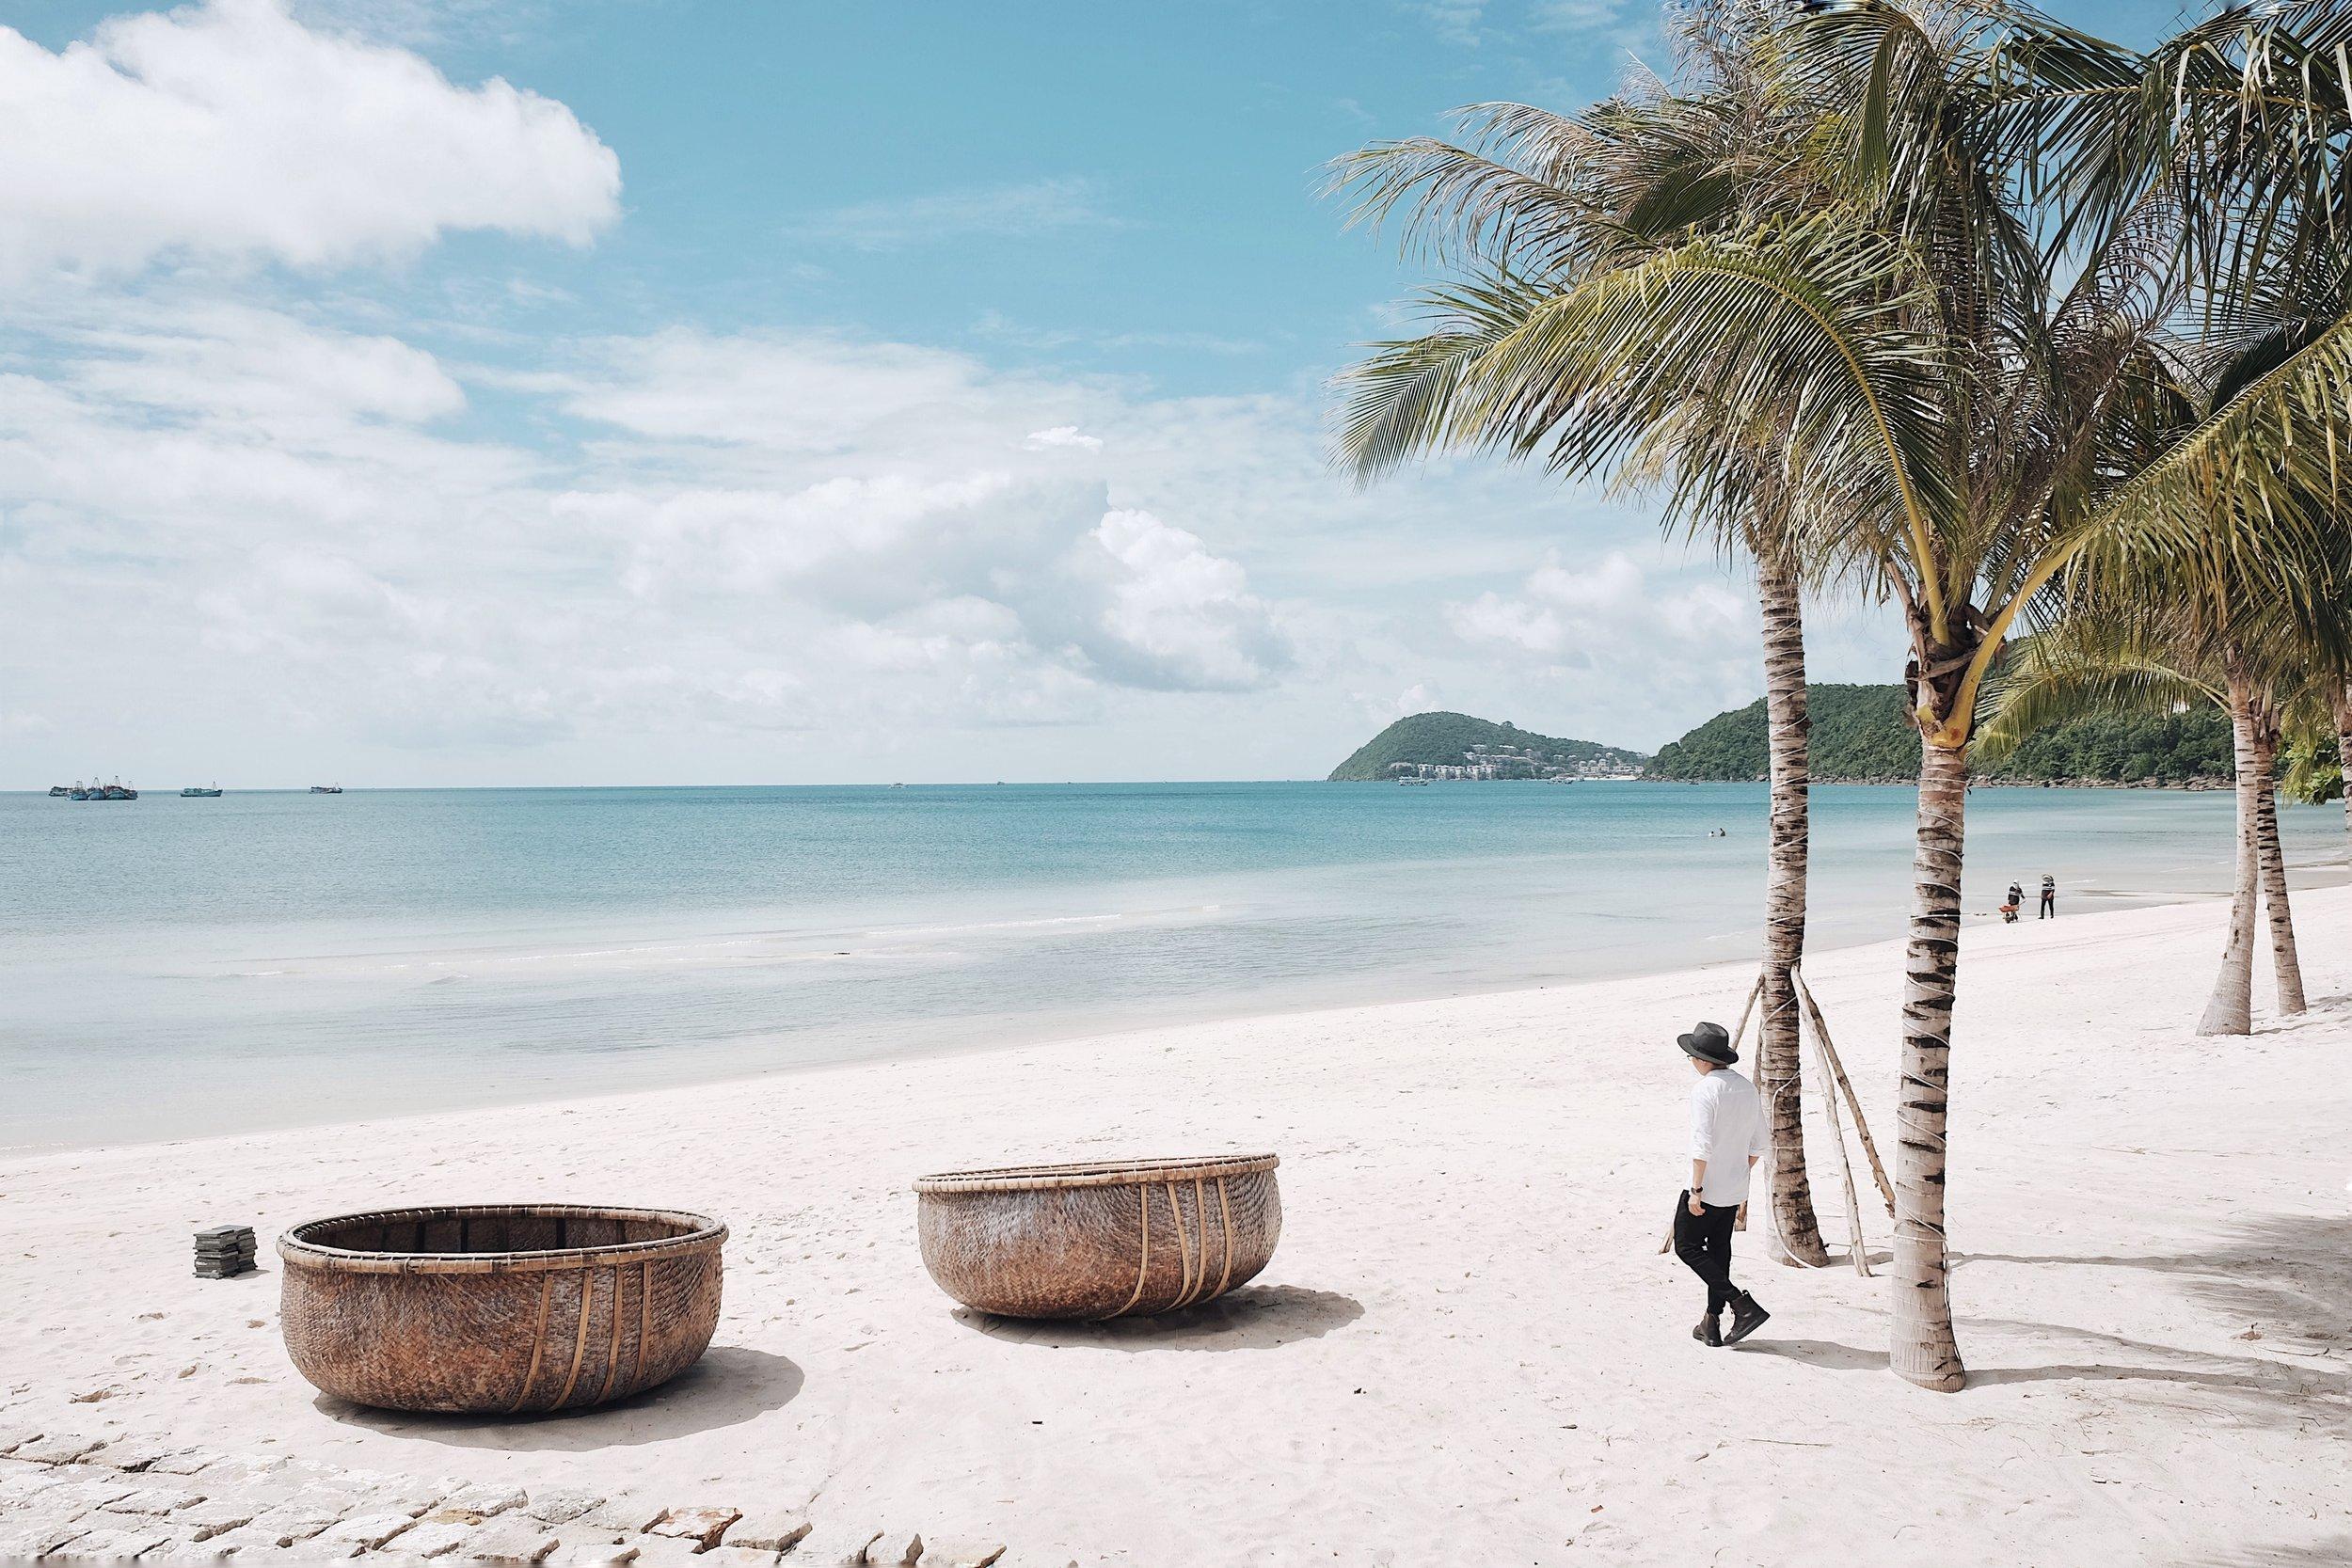 THE CHILL - JW MARRIOTT BEACH & RESORT